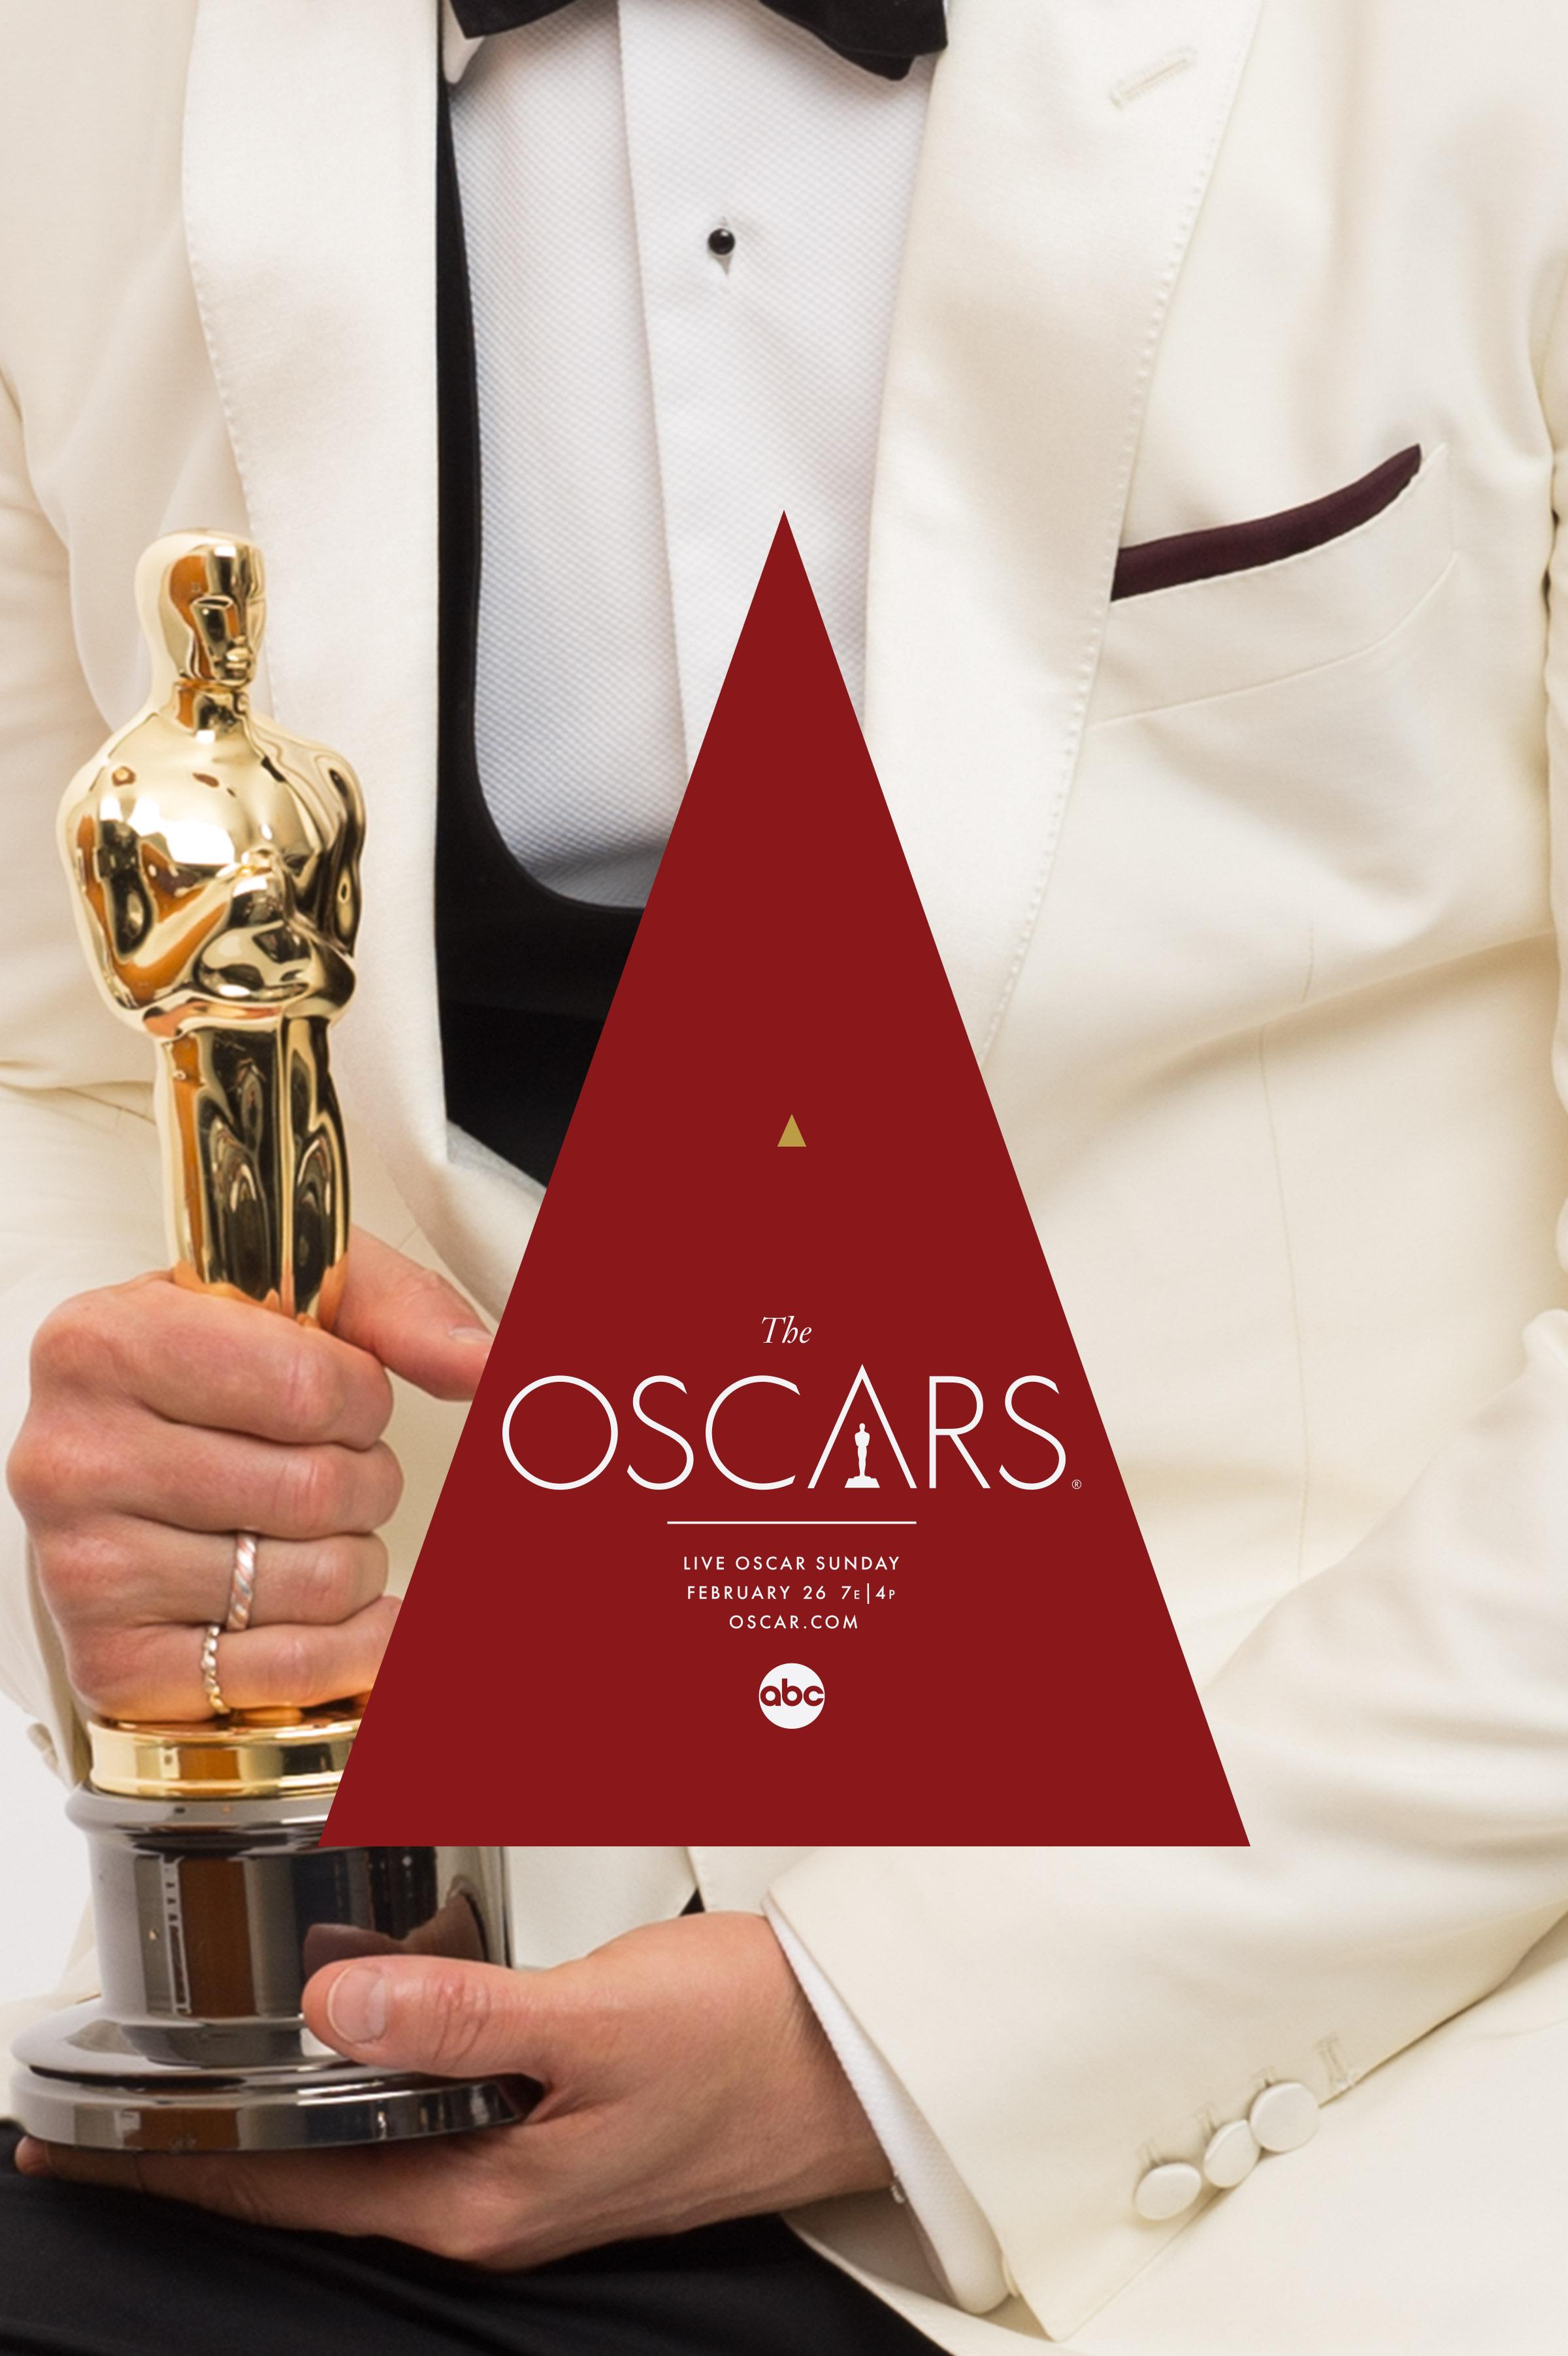 Oscar_ad_1.jpg